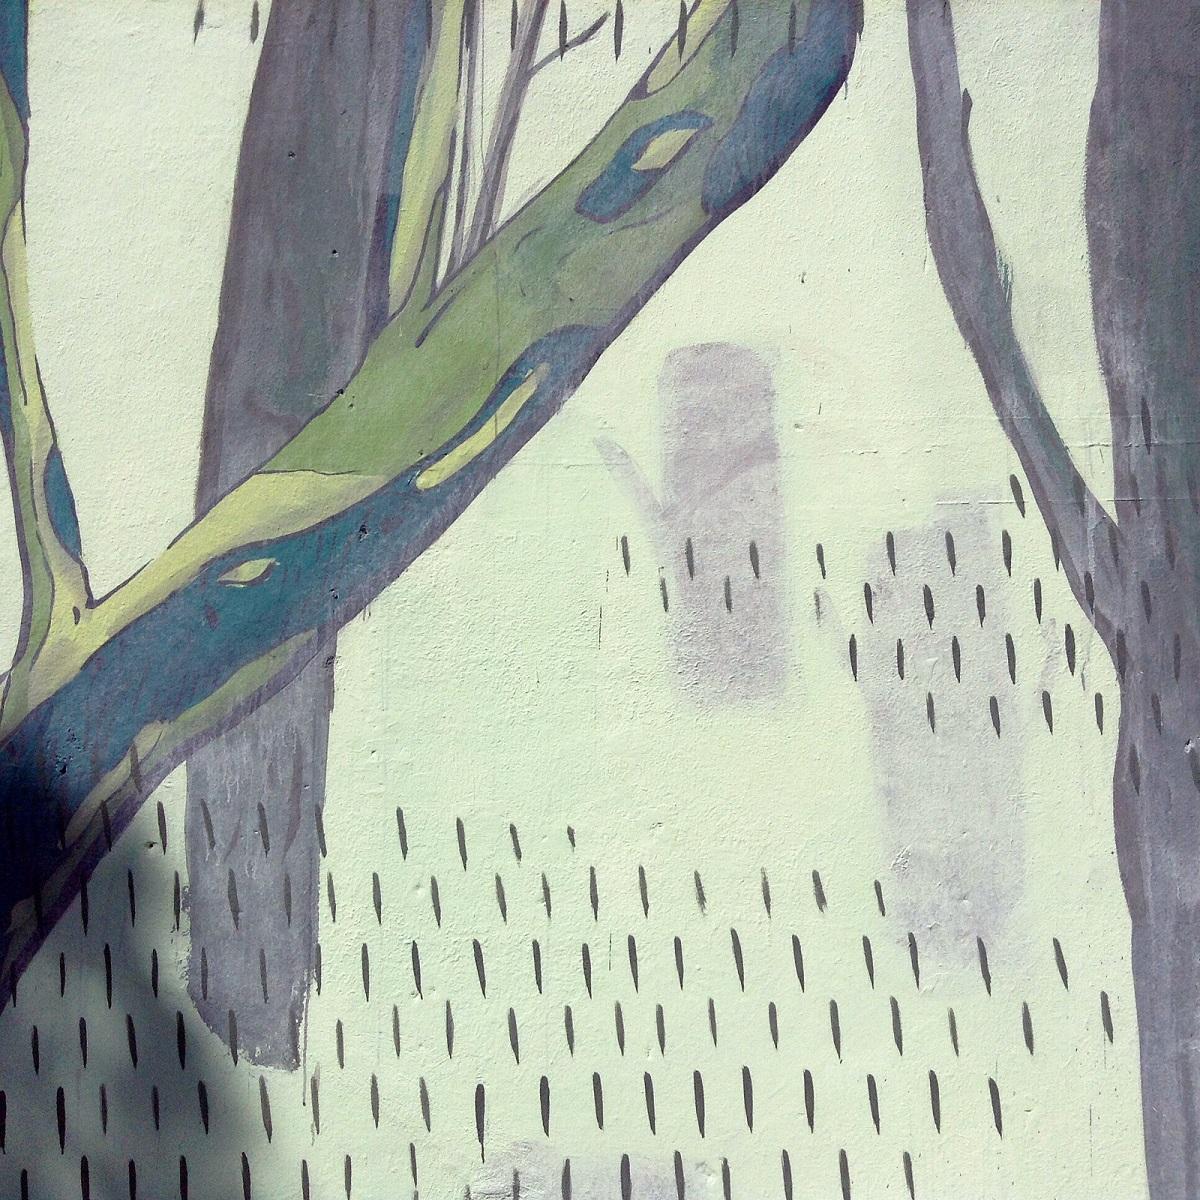 pastel-new-mural-in-cordoba-argentina-02